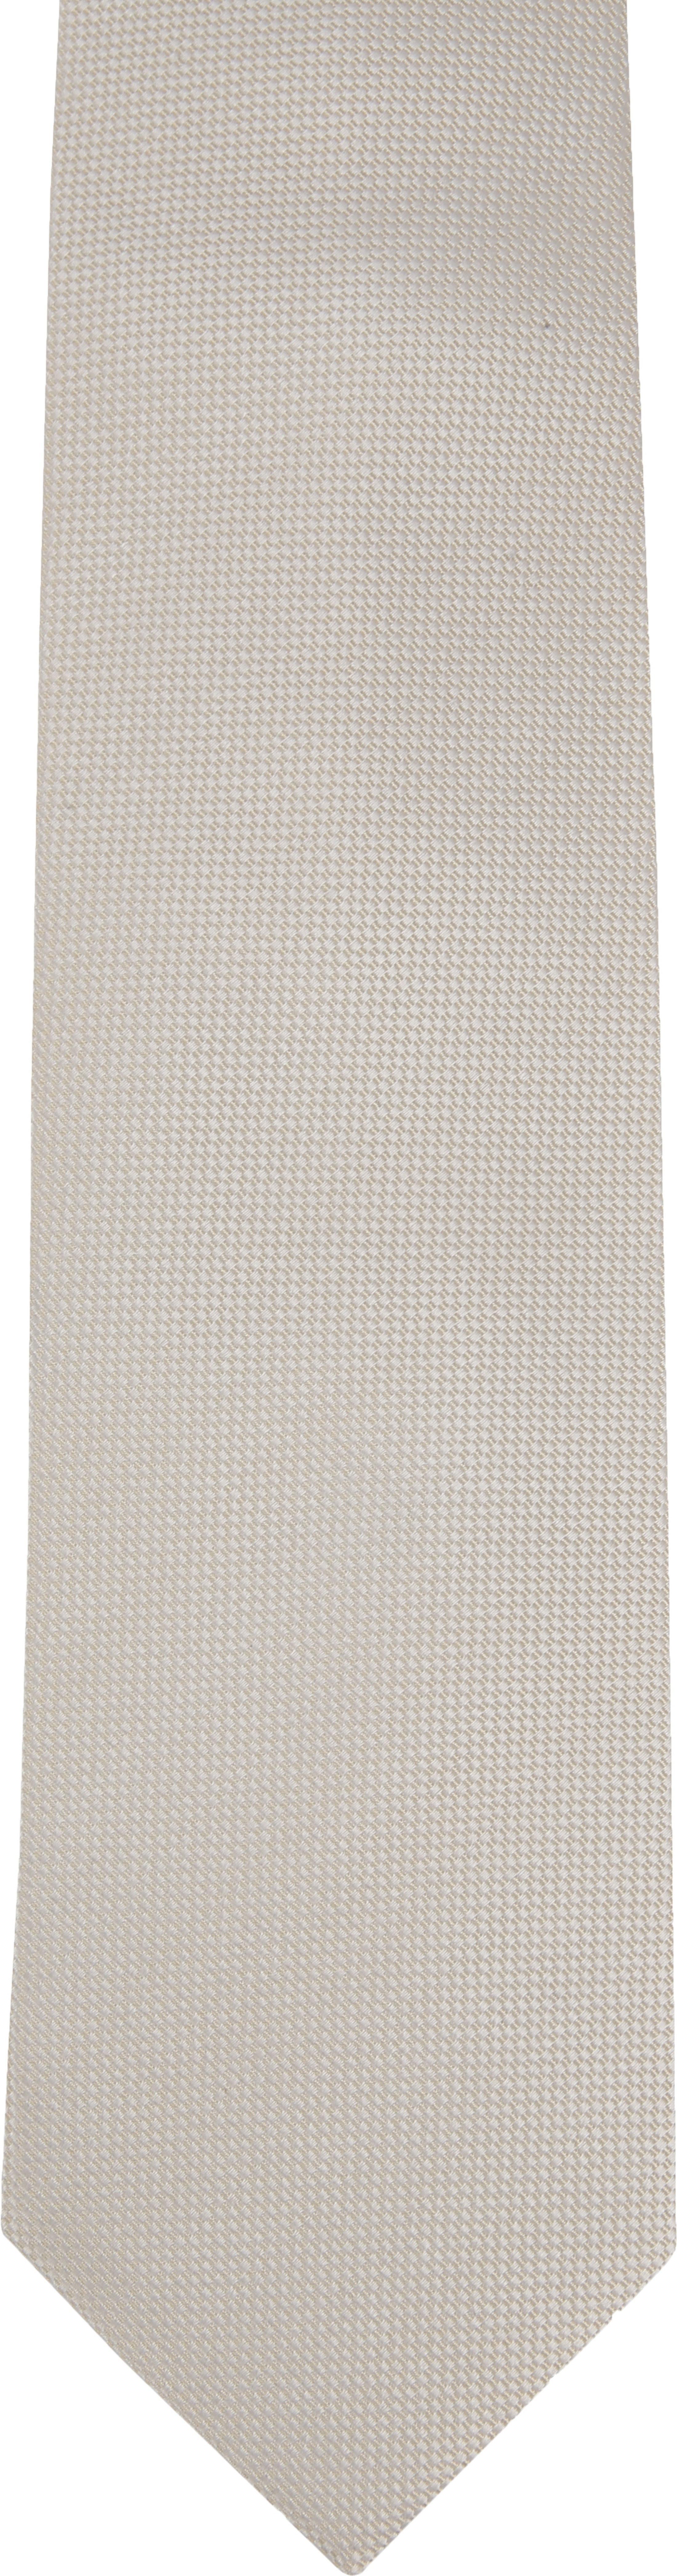 Suitable Krawatte Off-White foto 1